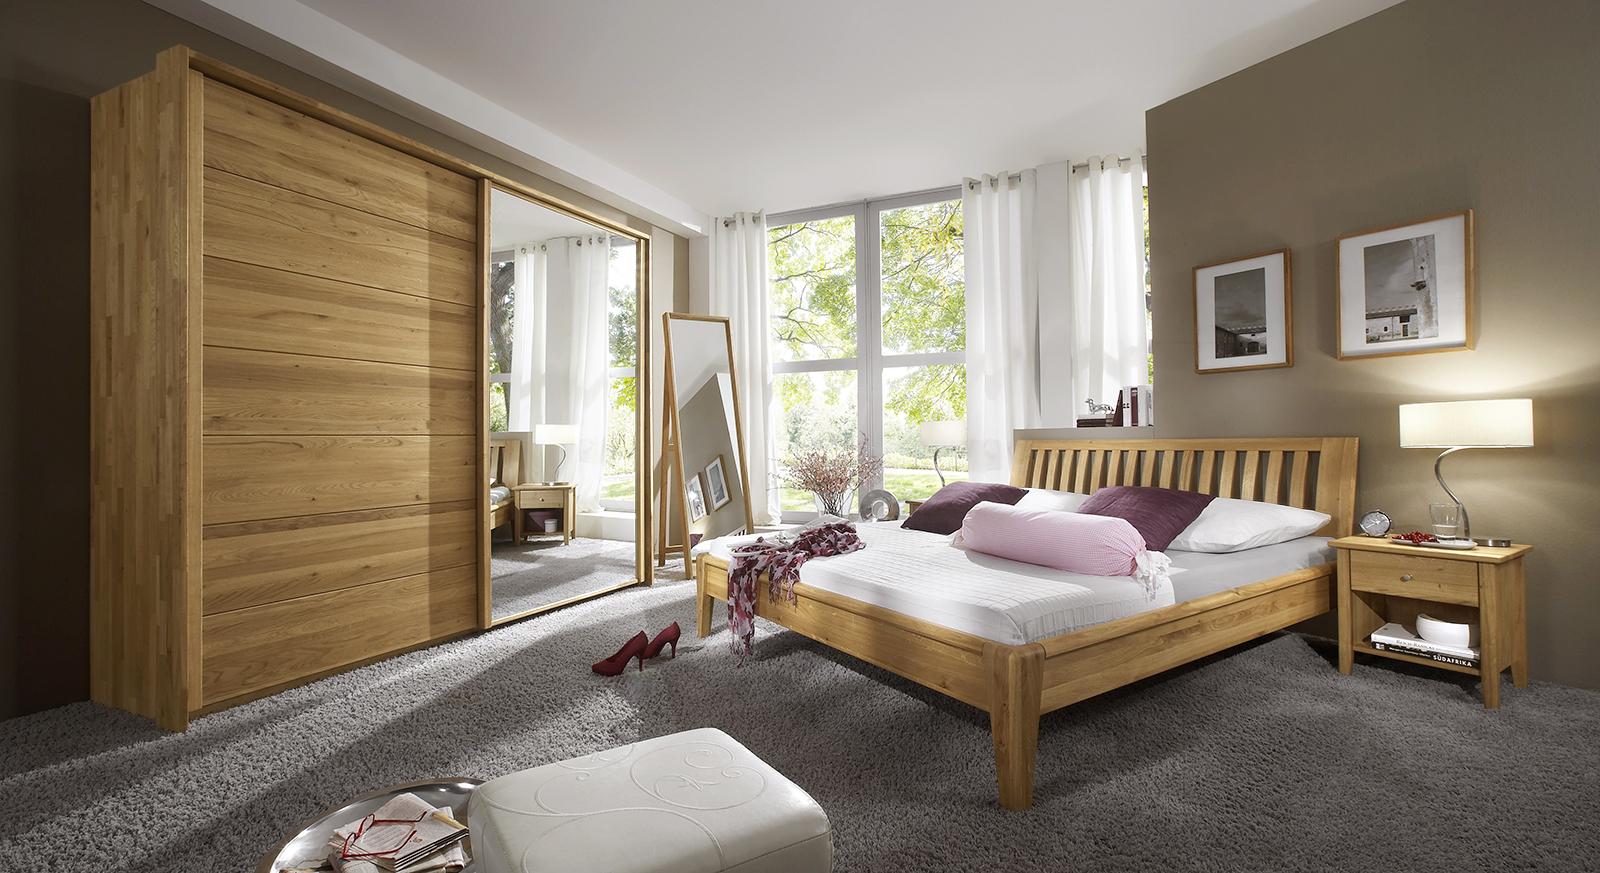 komplett-schlafzimmer aus massivholz eiche -roseville